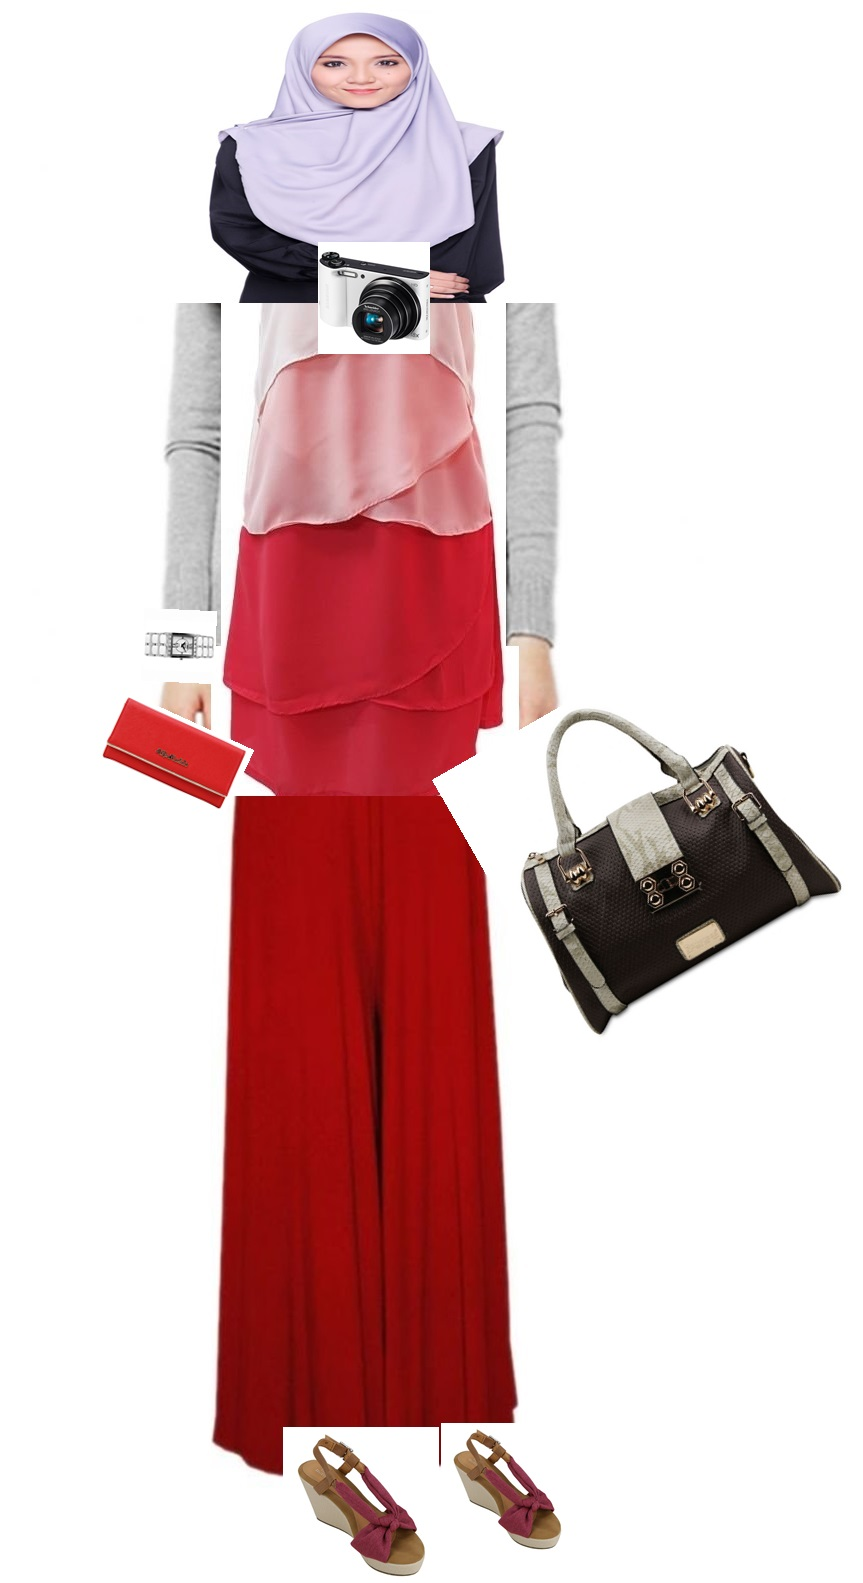 bergaya dengan lazada, shopping di Lazada